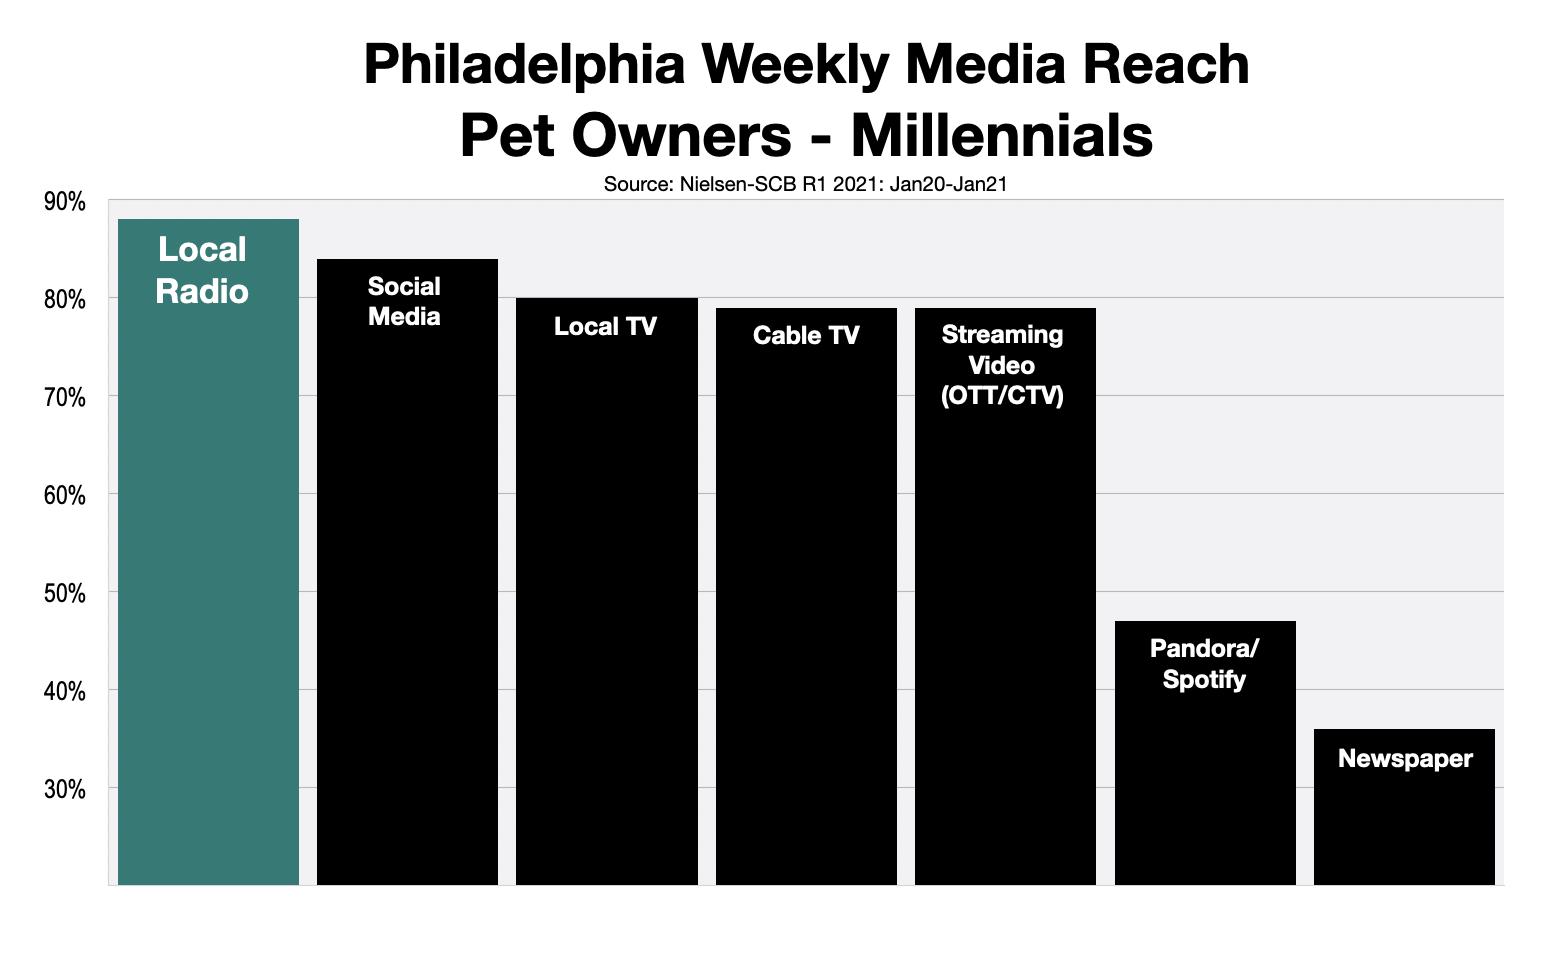 Advertising To Millennials Pet Owners In Philadelphia